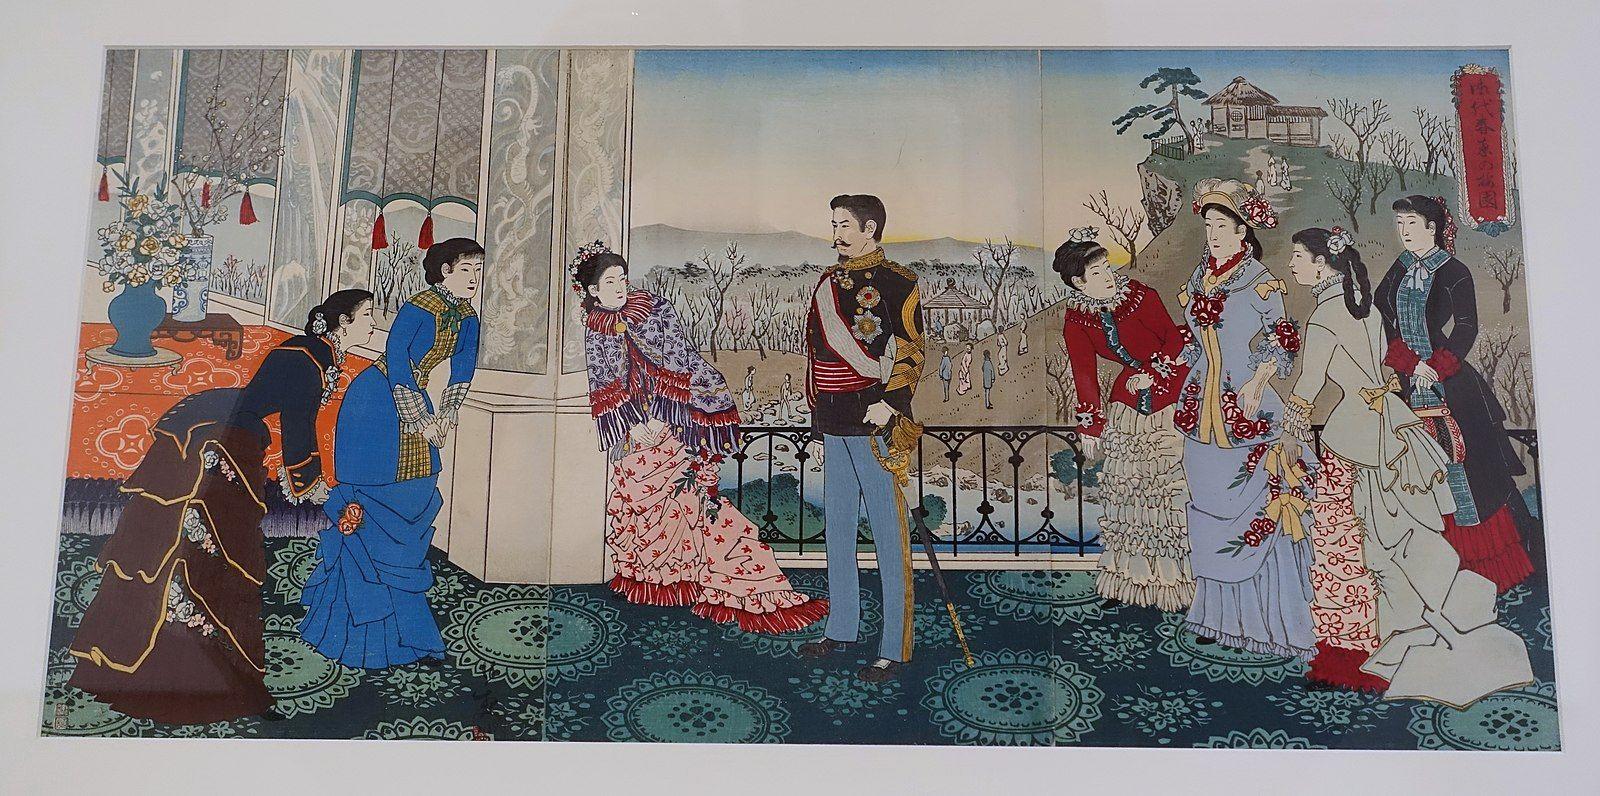 Emperor Meiji and his Consort in the Plum Garden, by Kobayashi Kiyochika, Japan, Meiji period, 1887 AD